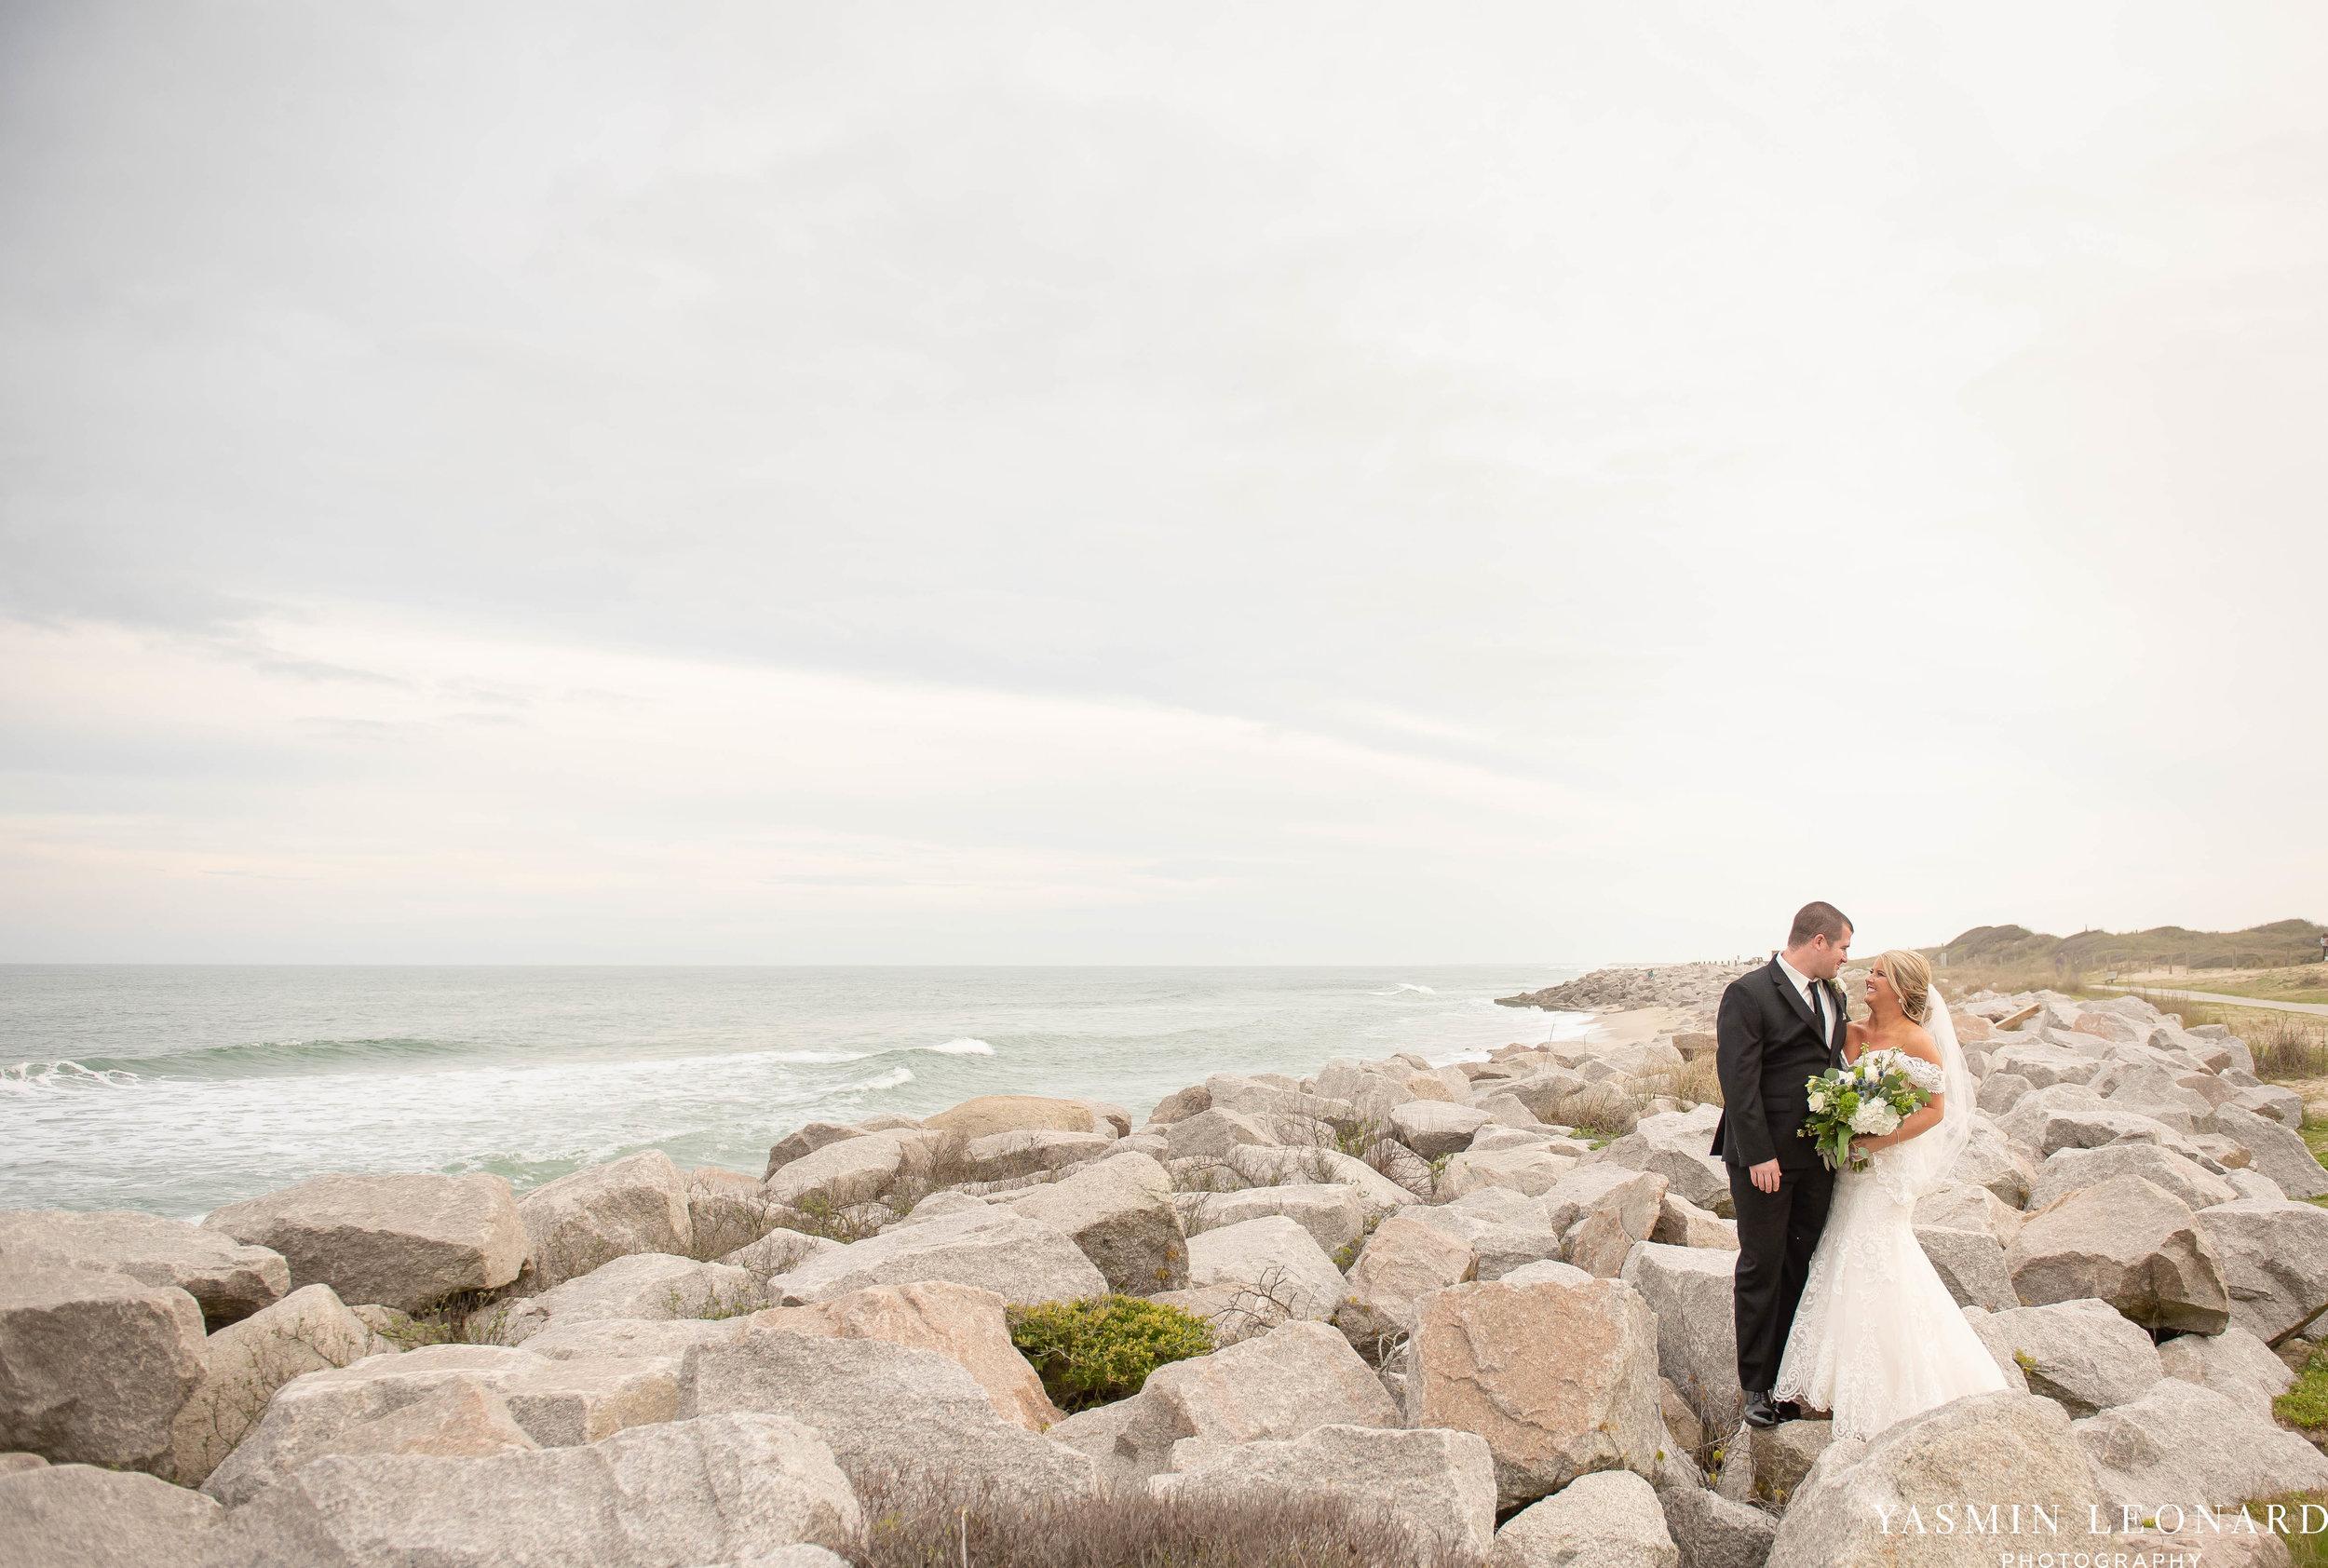 Carolina Beach Wedding - Fort Fisher Wedding - NC Acquarium - Beach Wedding - NC Wedding - Beach Wedding Inspiration - Beach Bride-28.jpg